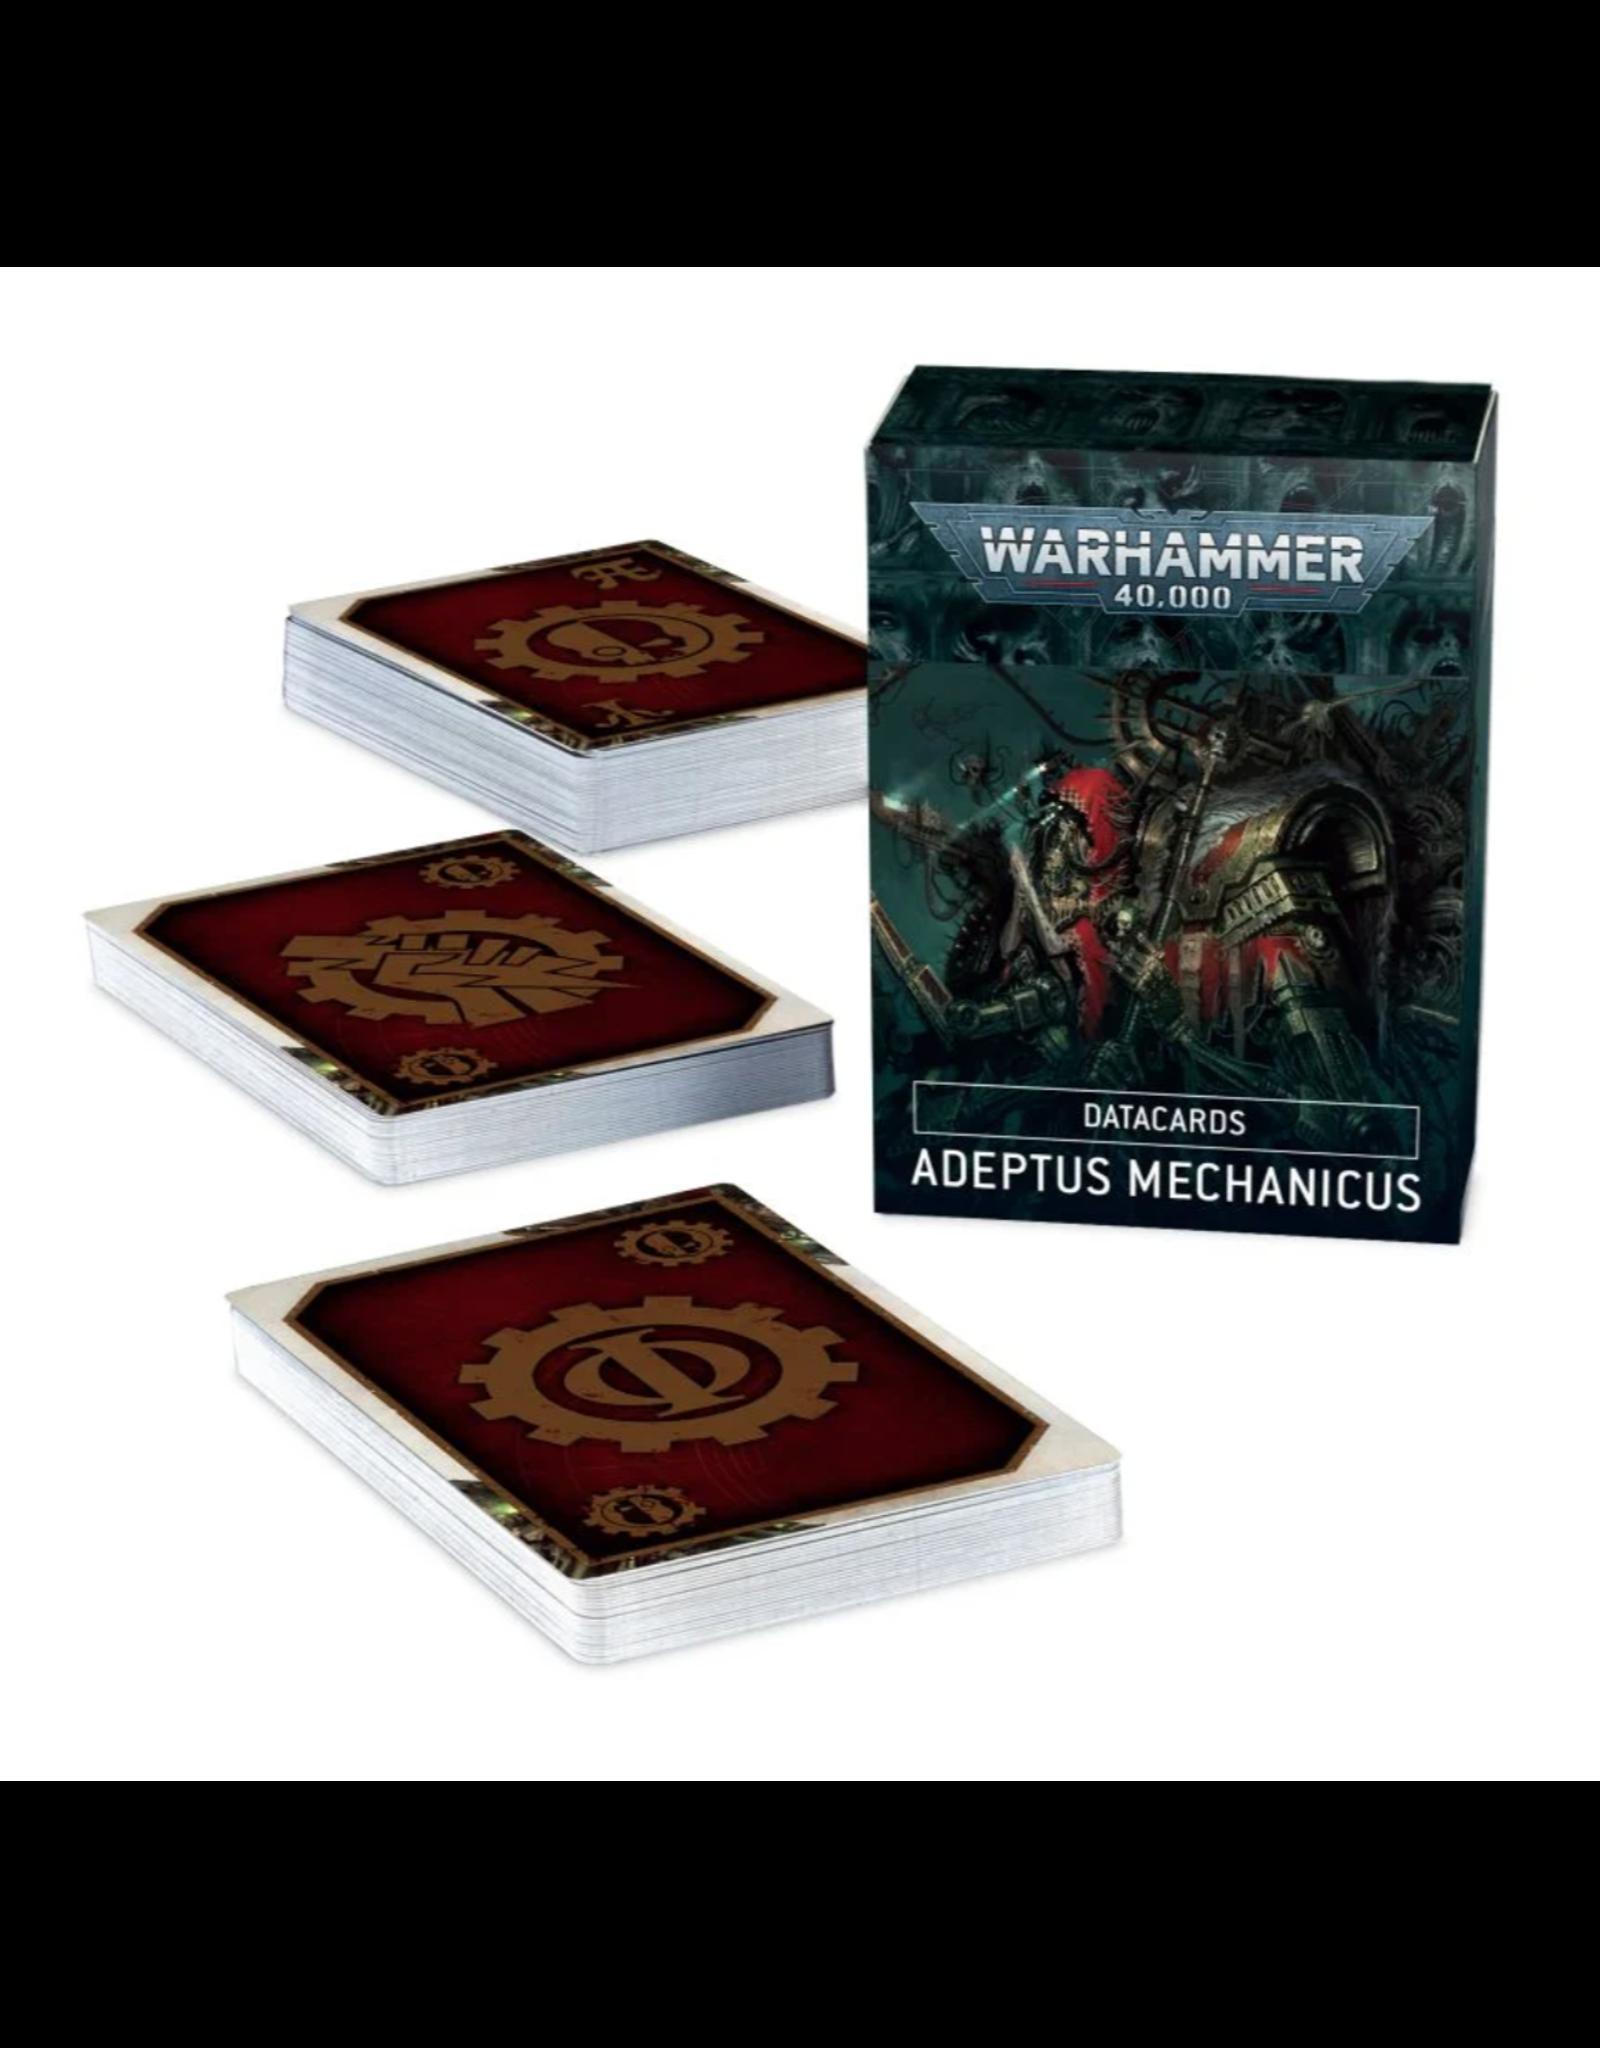 Warhammer 40K Datacards: Adeptus Mechanicus